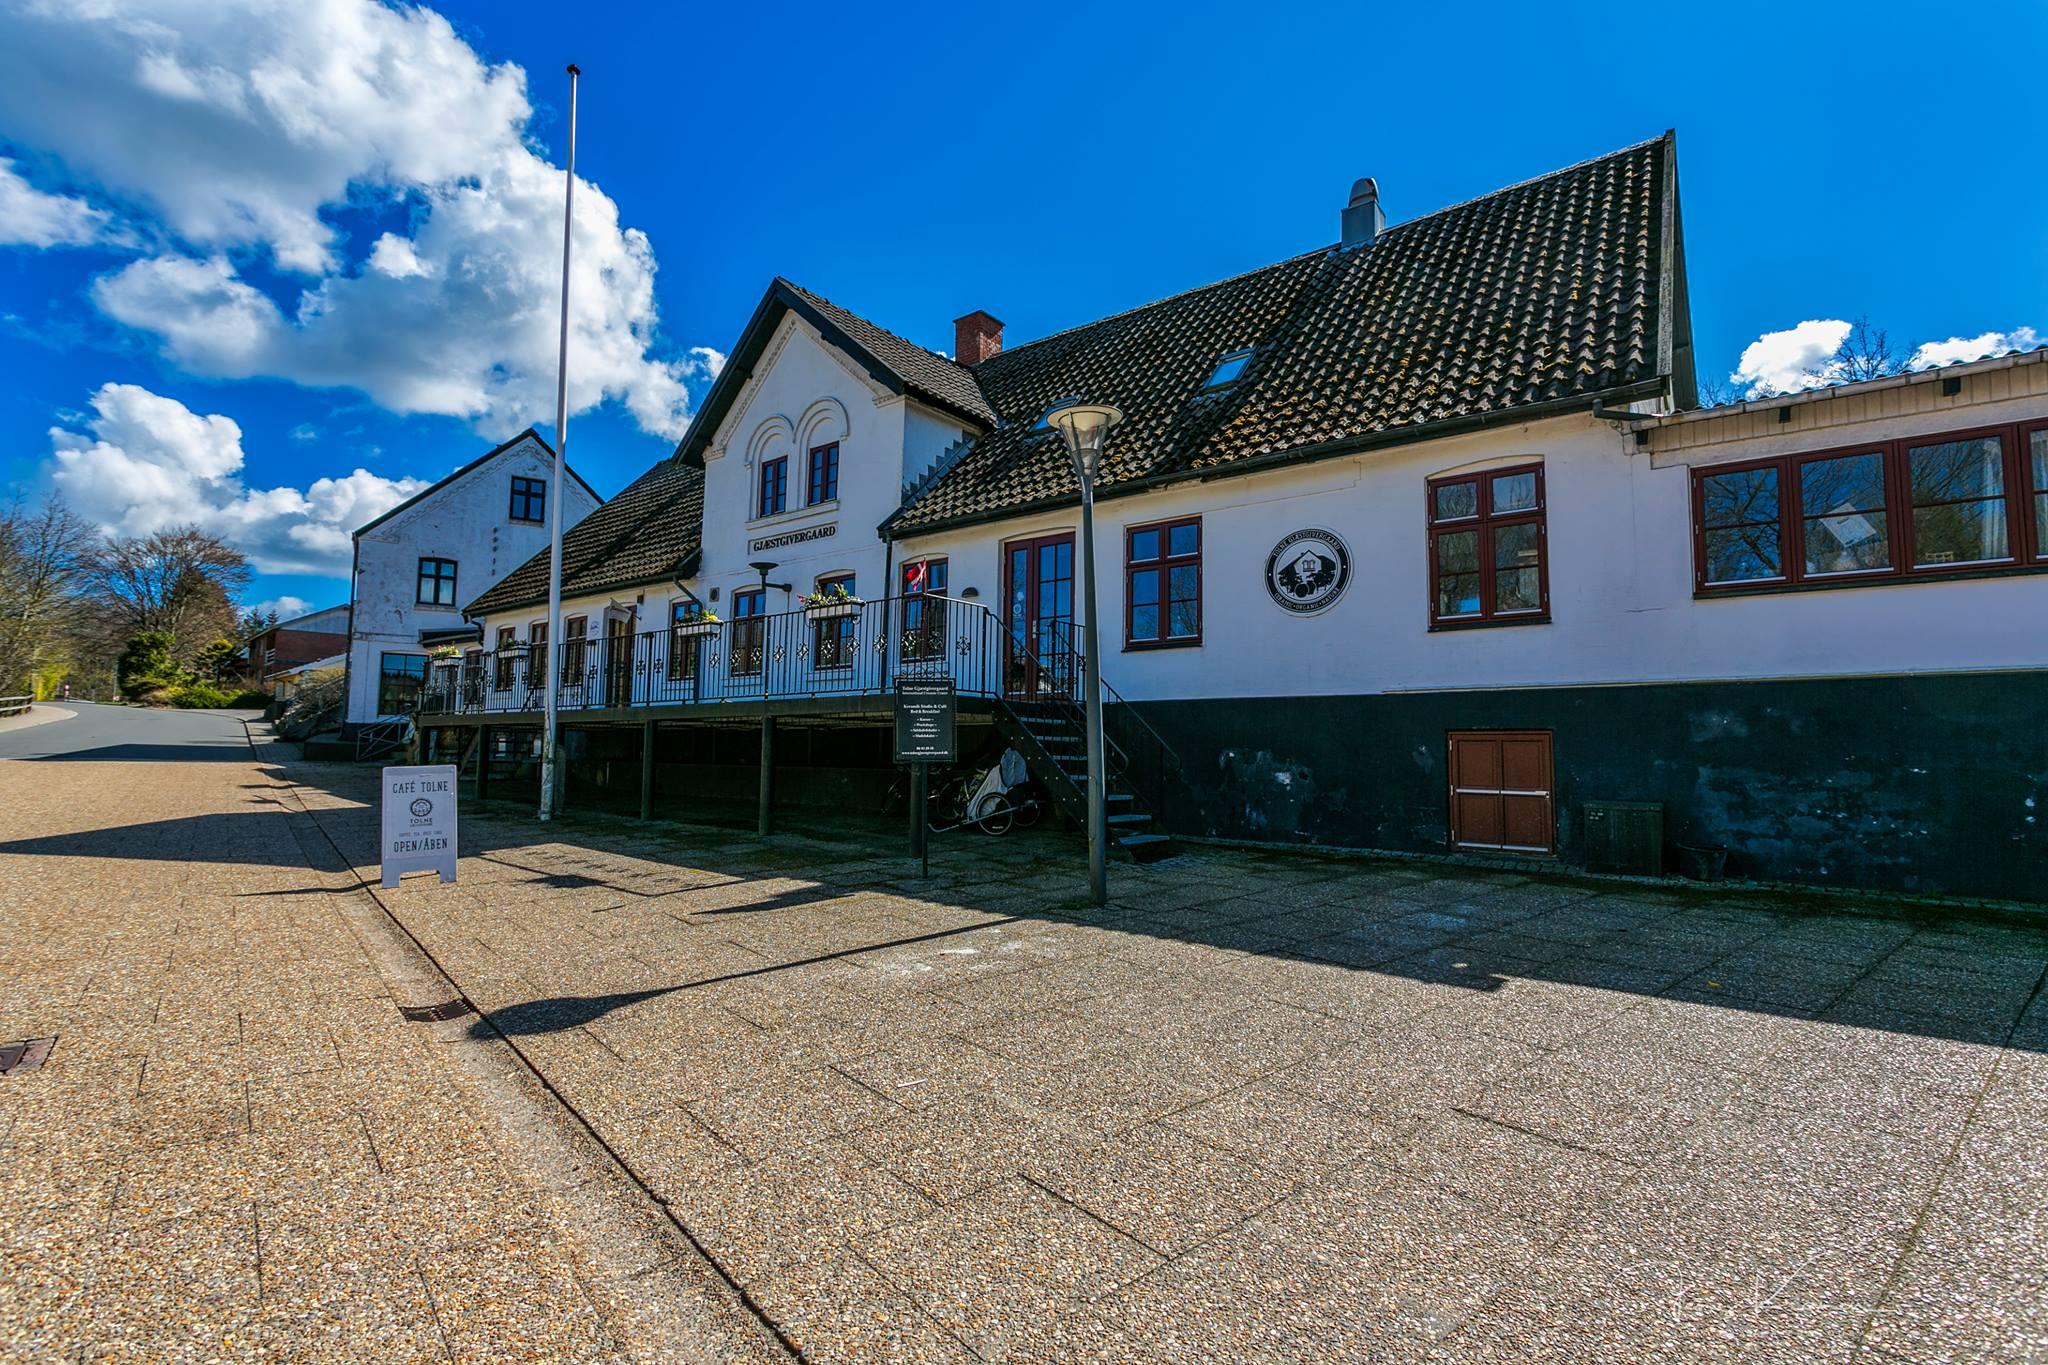 TOLNE - Tolne Gjæstgivergaard houses a unique ceramic retreat center in northern Denmark.